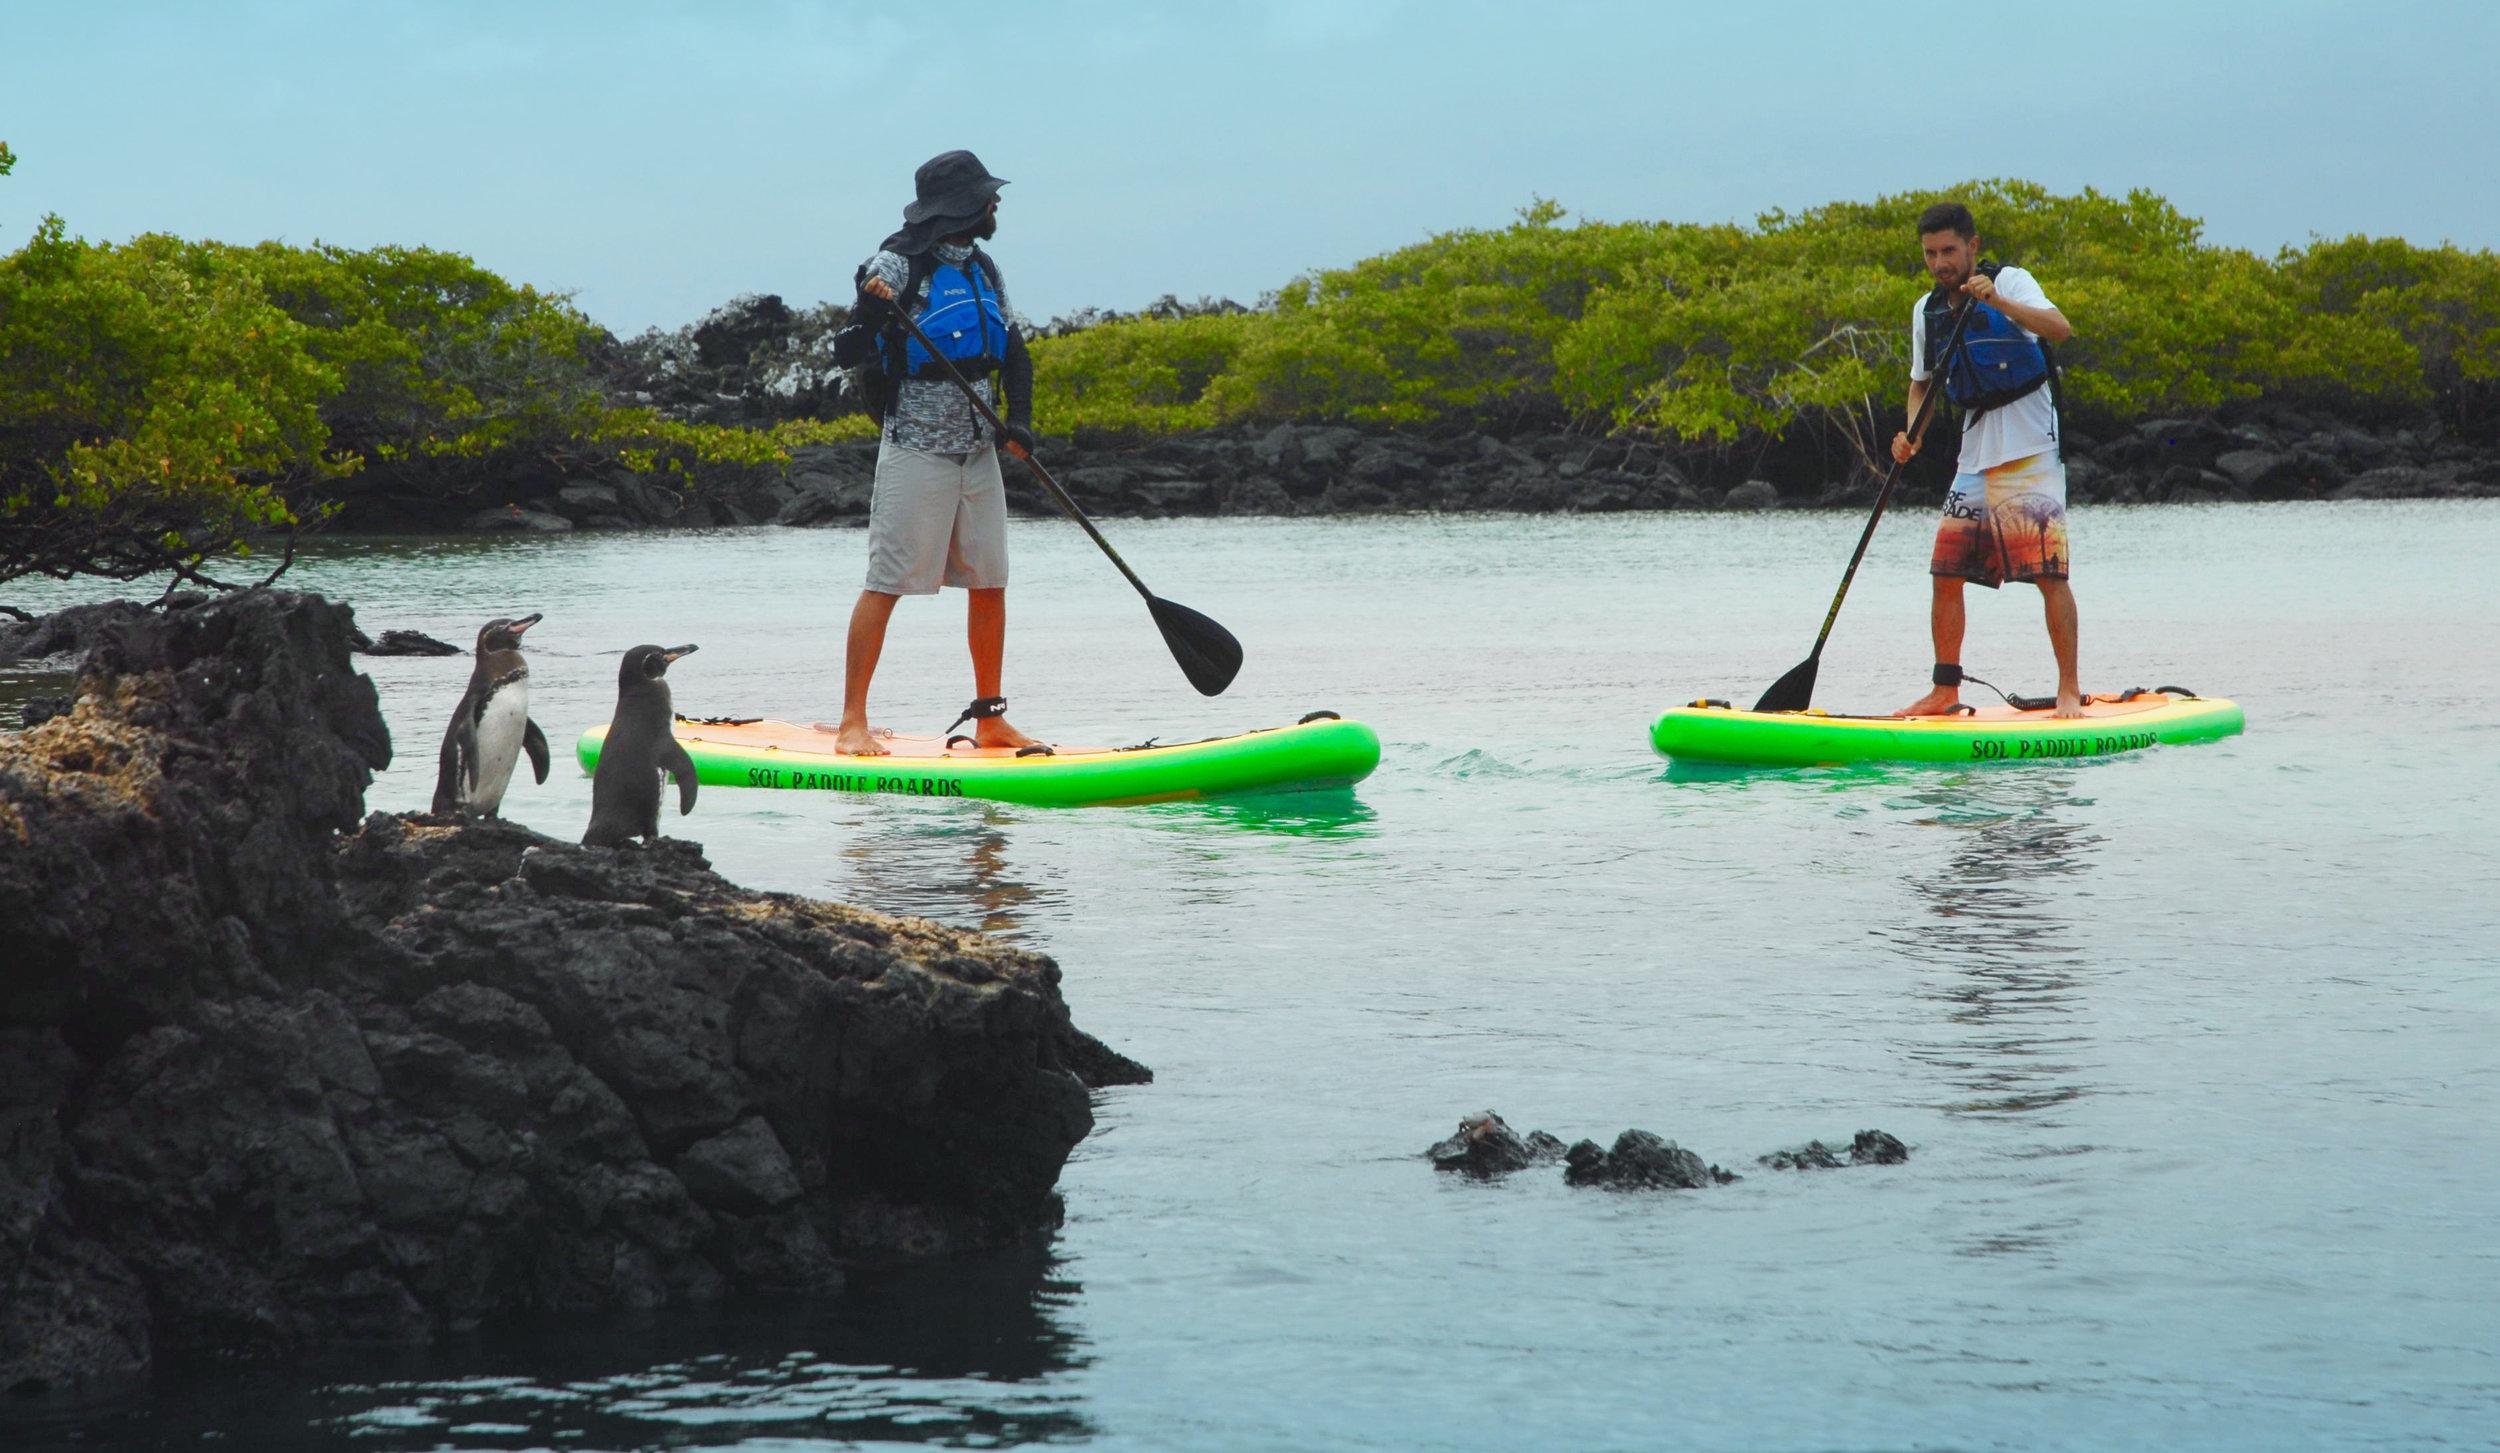 book tours to Galapagos SUP paddle galapagos Islands best honeymoon adventure destination romantic wildlife best  adventure tour.jpg